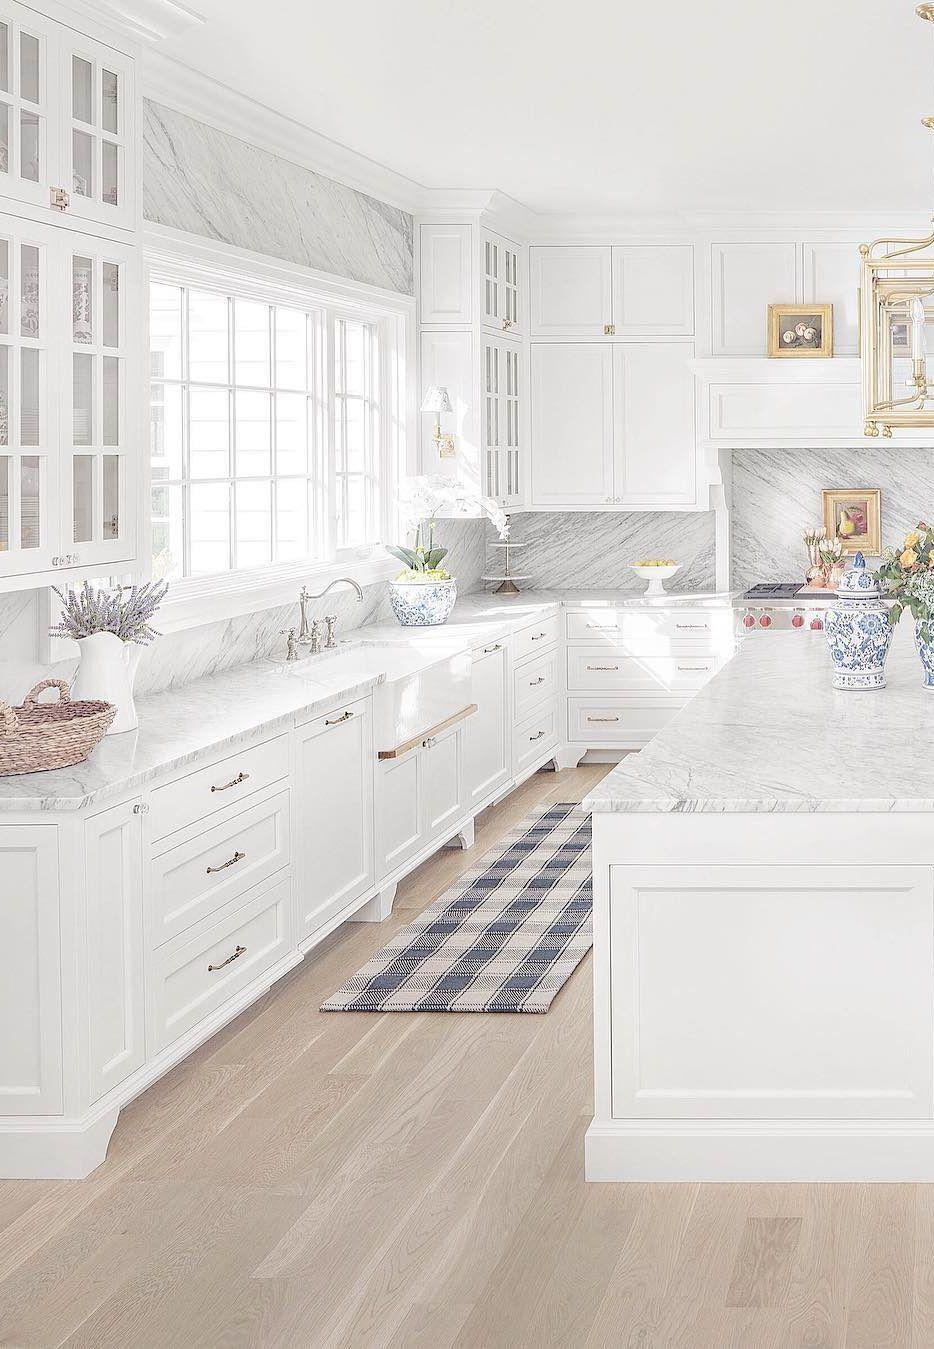 9+ Beauty Latest Kitchen Design Trends Ideas for 9 Part 9 ...